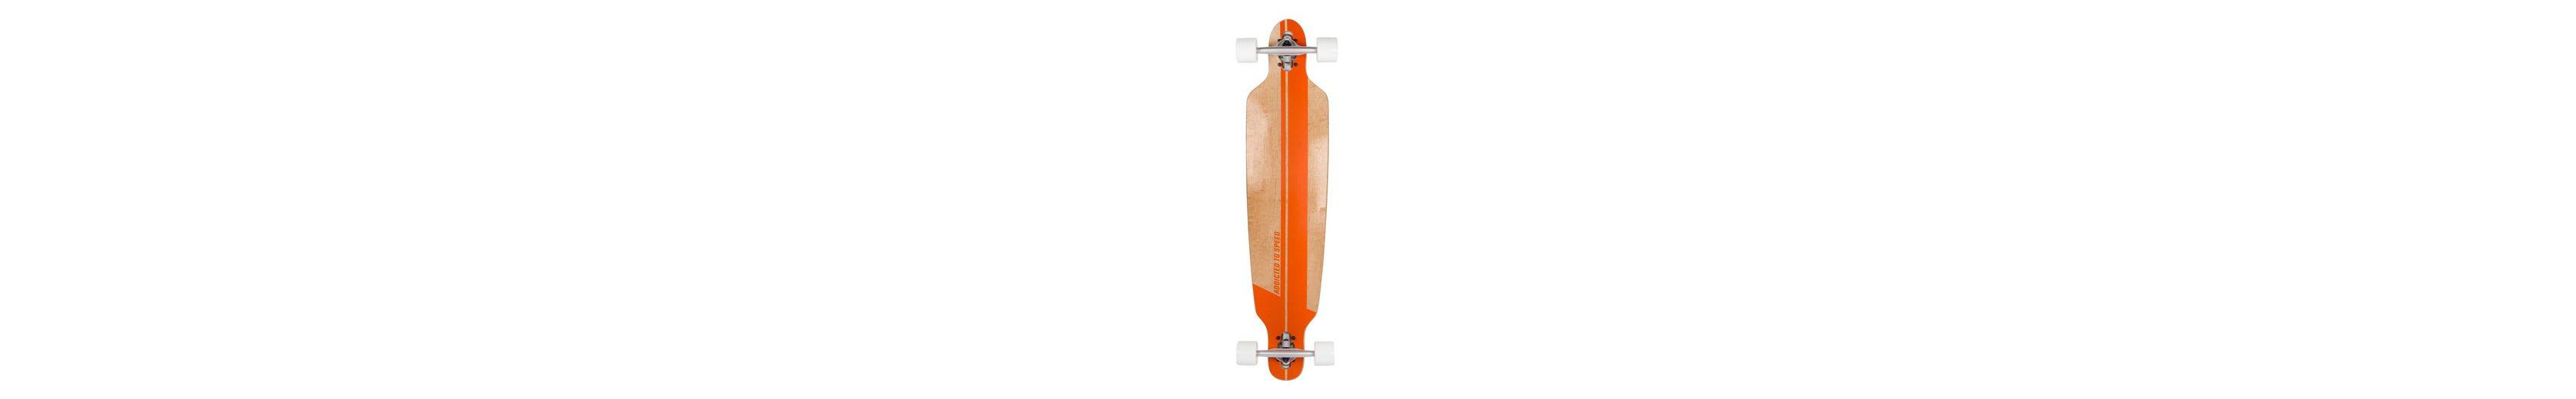 Sportplus Longboard, Longboard Concave - Lowrider, »Speedy SP-SB-102«